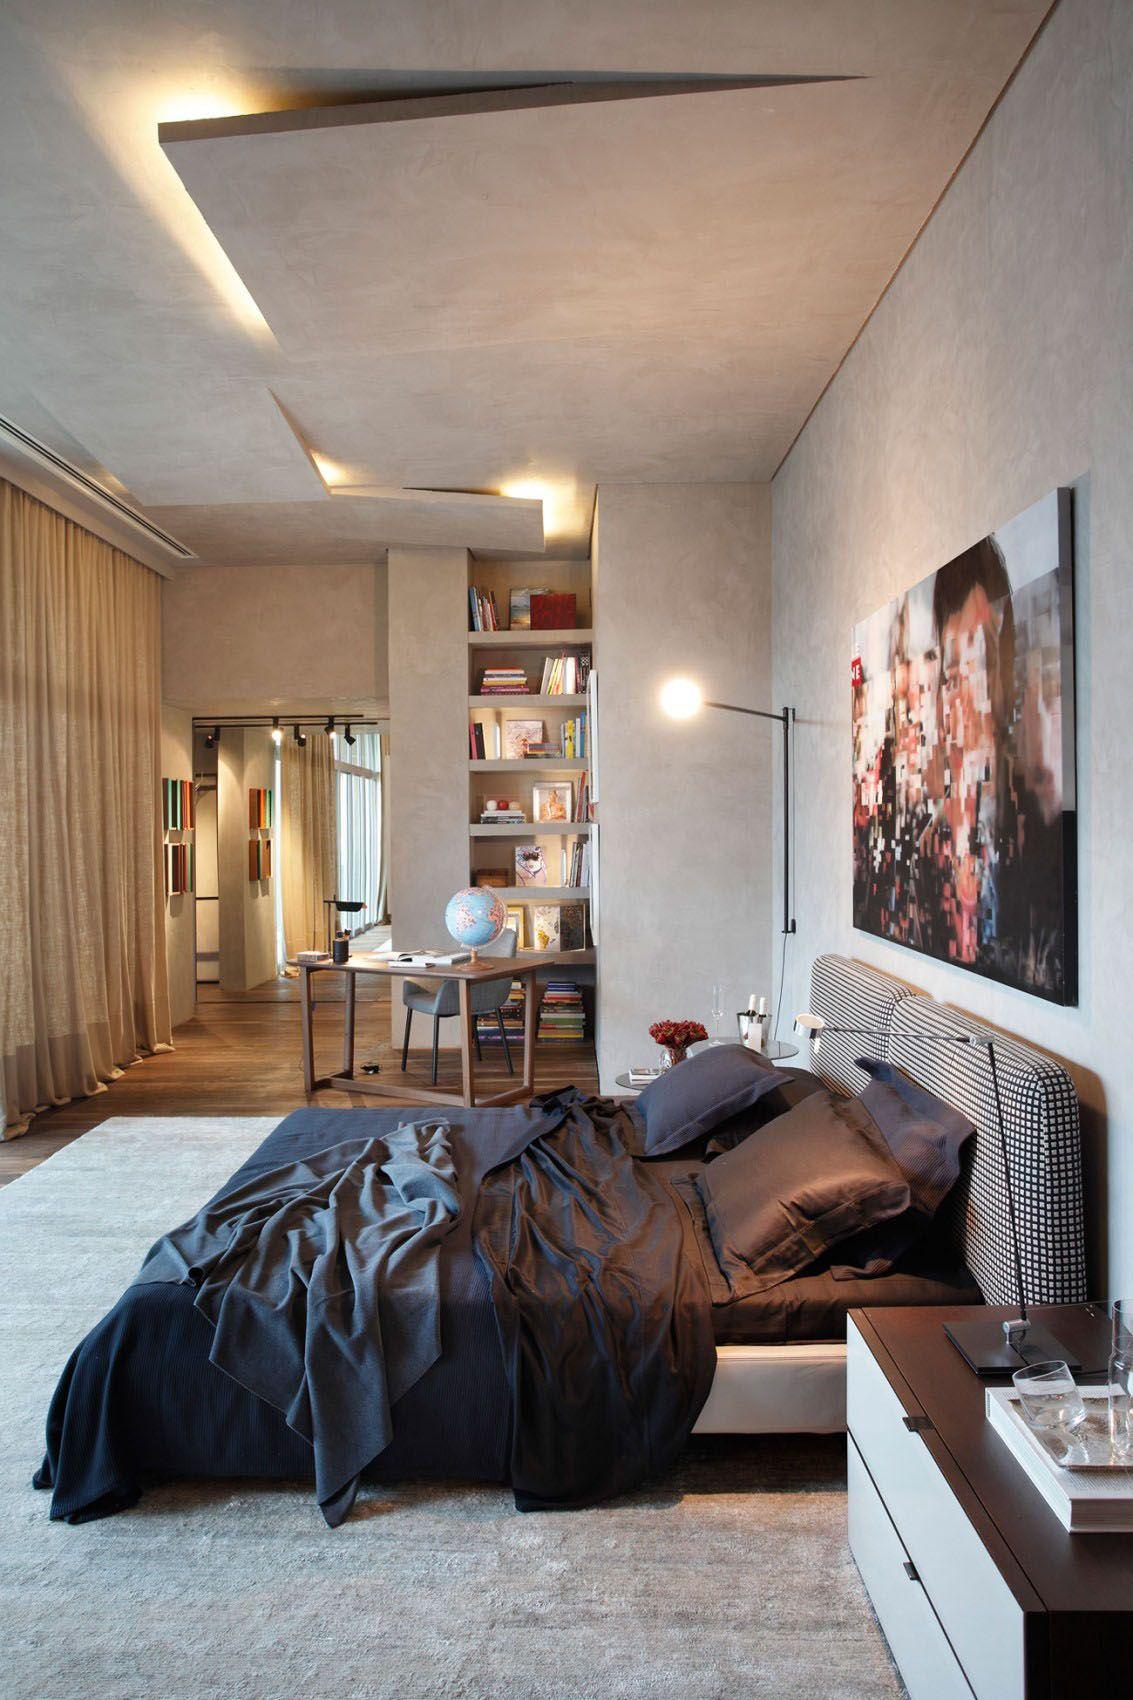 30 Ceiling Design Ideas to Inspire Your Next Home Makeover - https:-- freshome